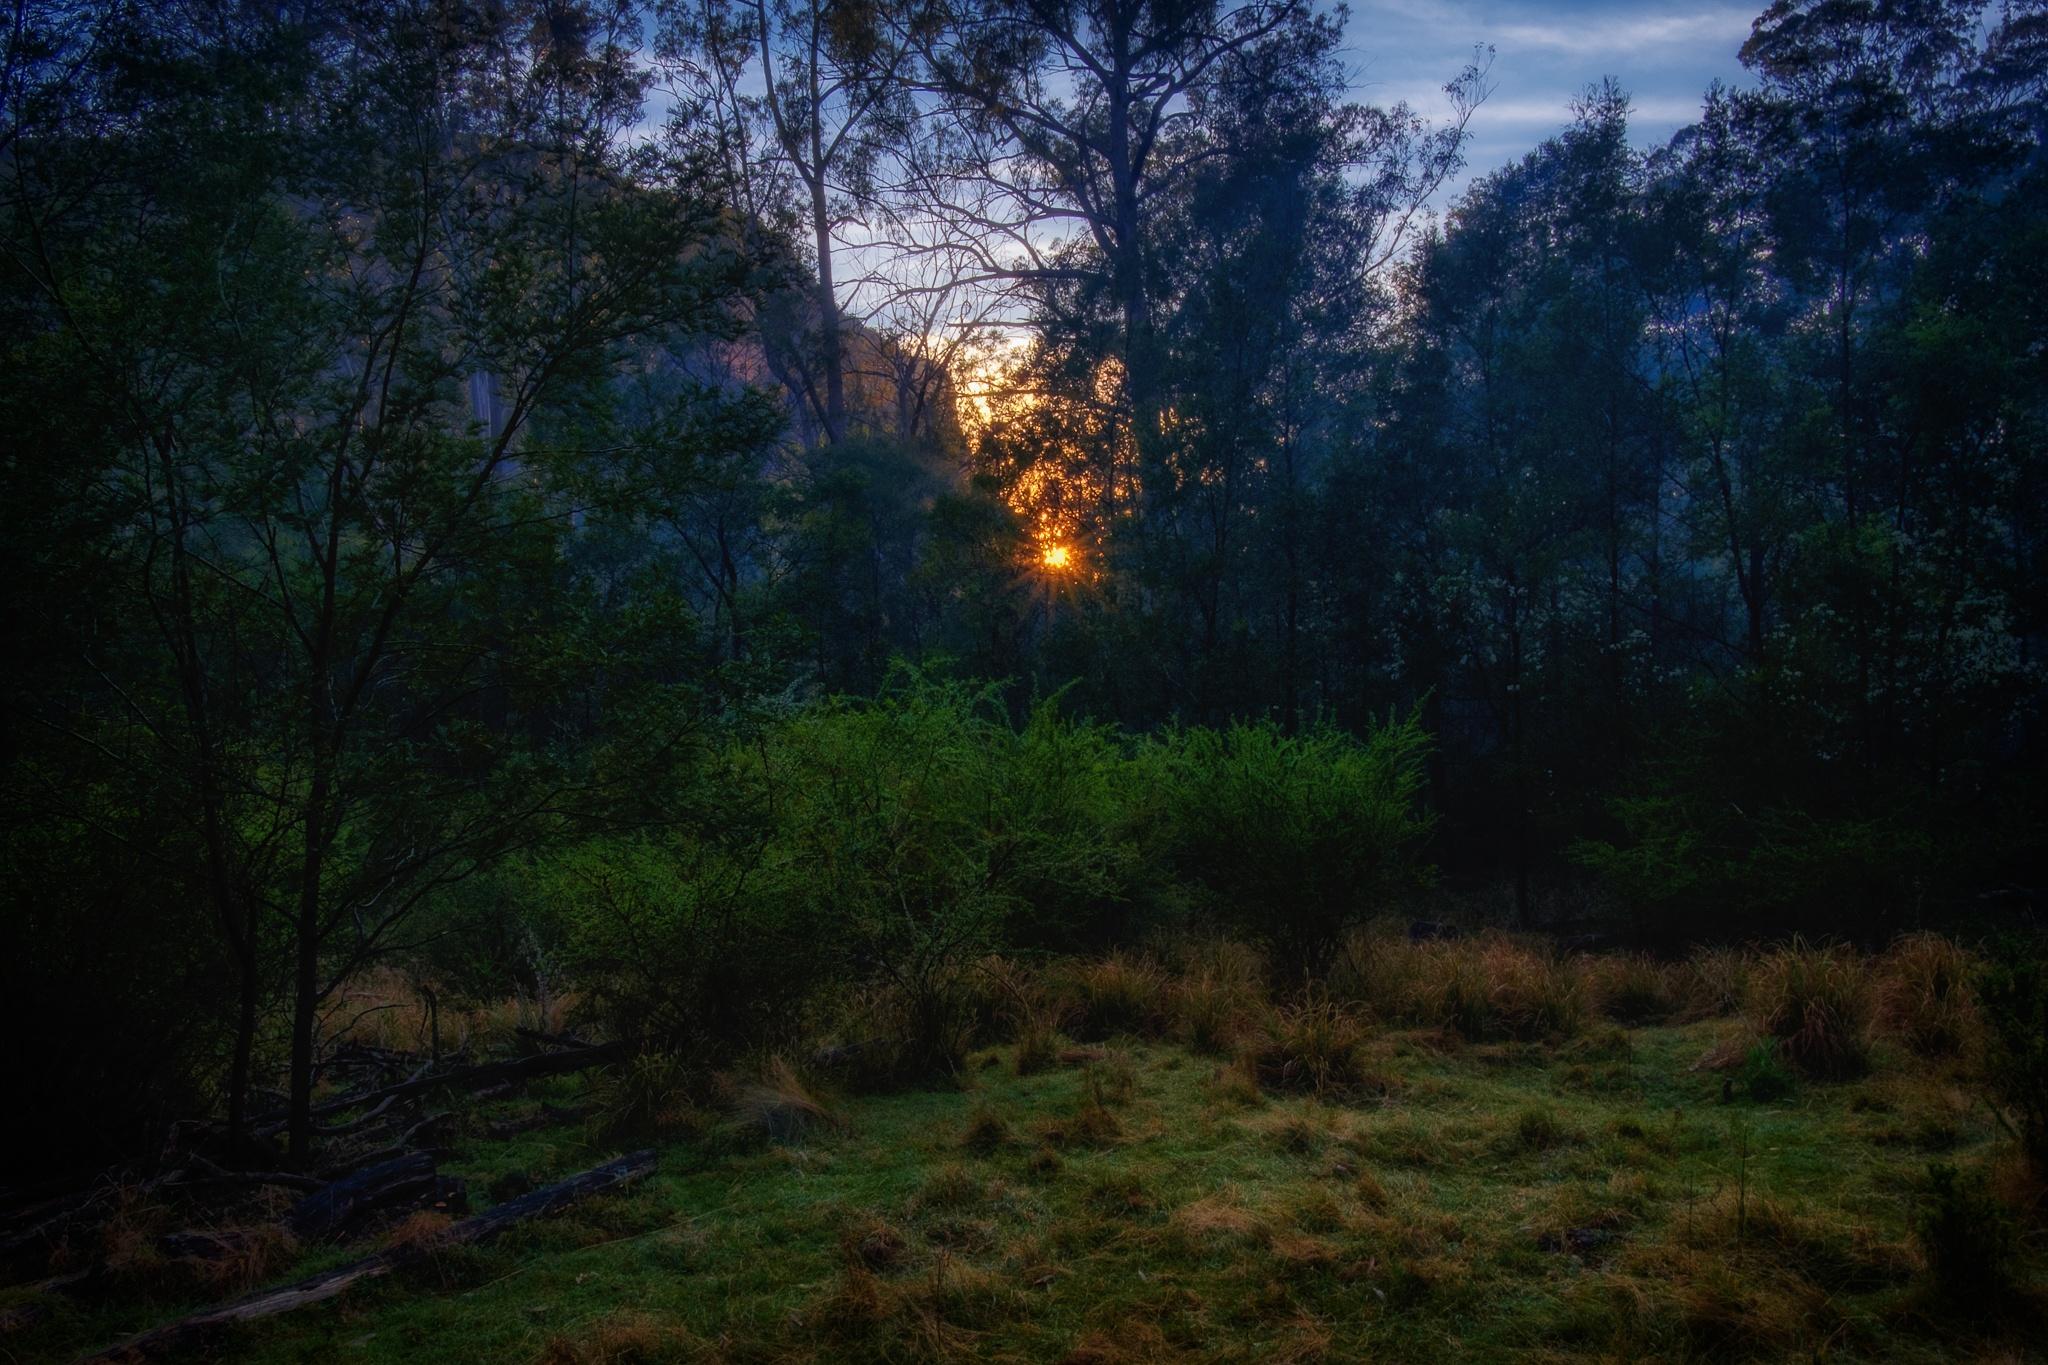 Sunrise at Annie Rowan by Peter Medbury